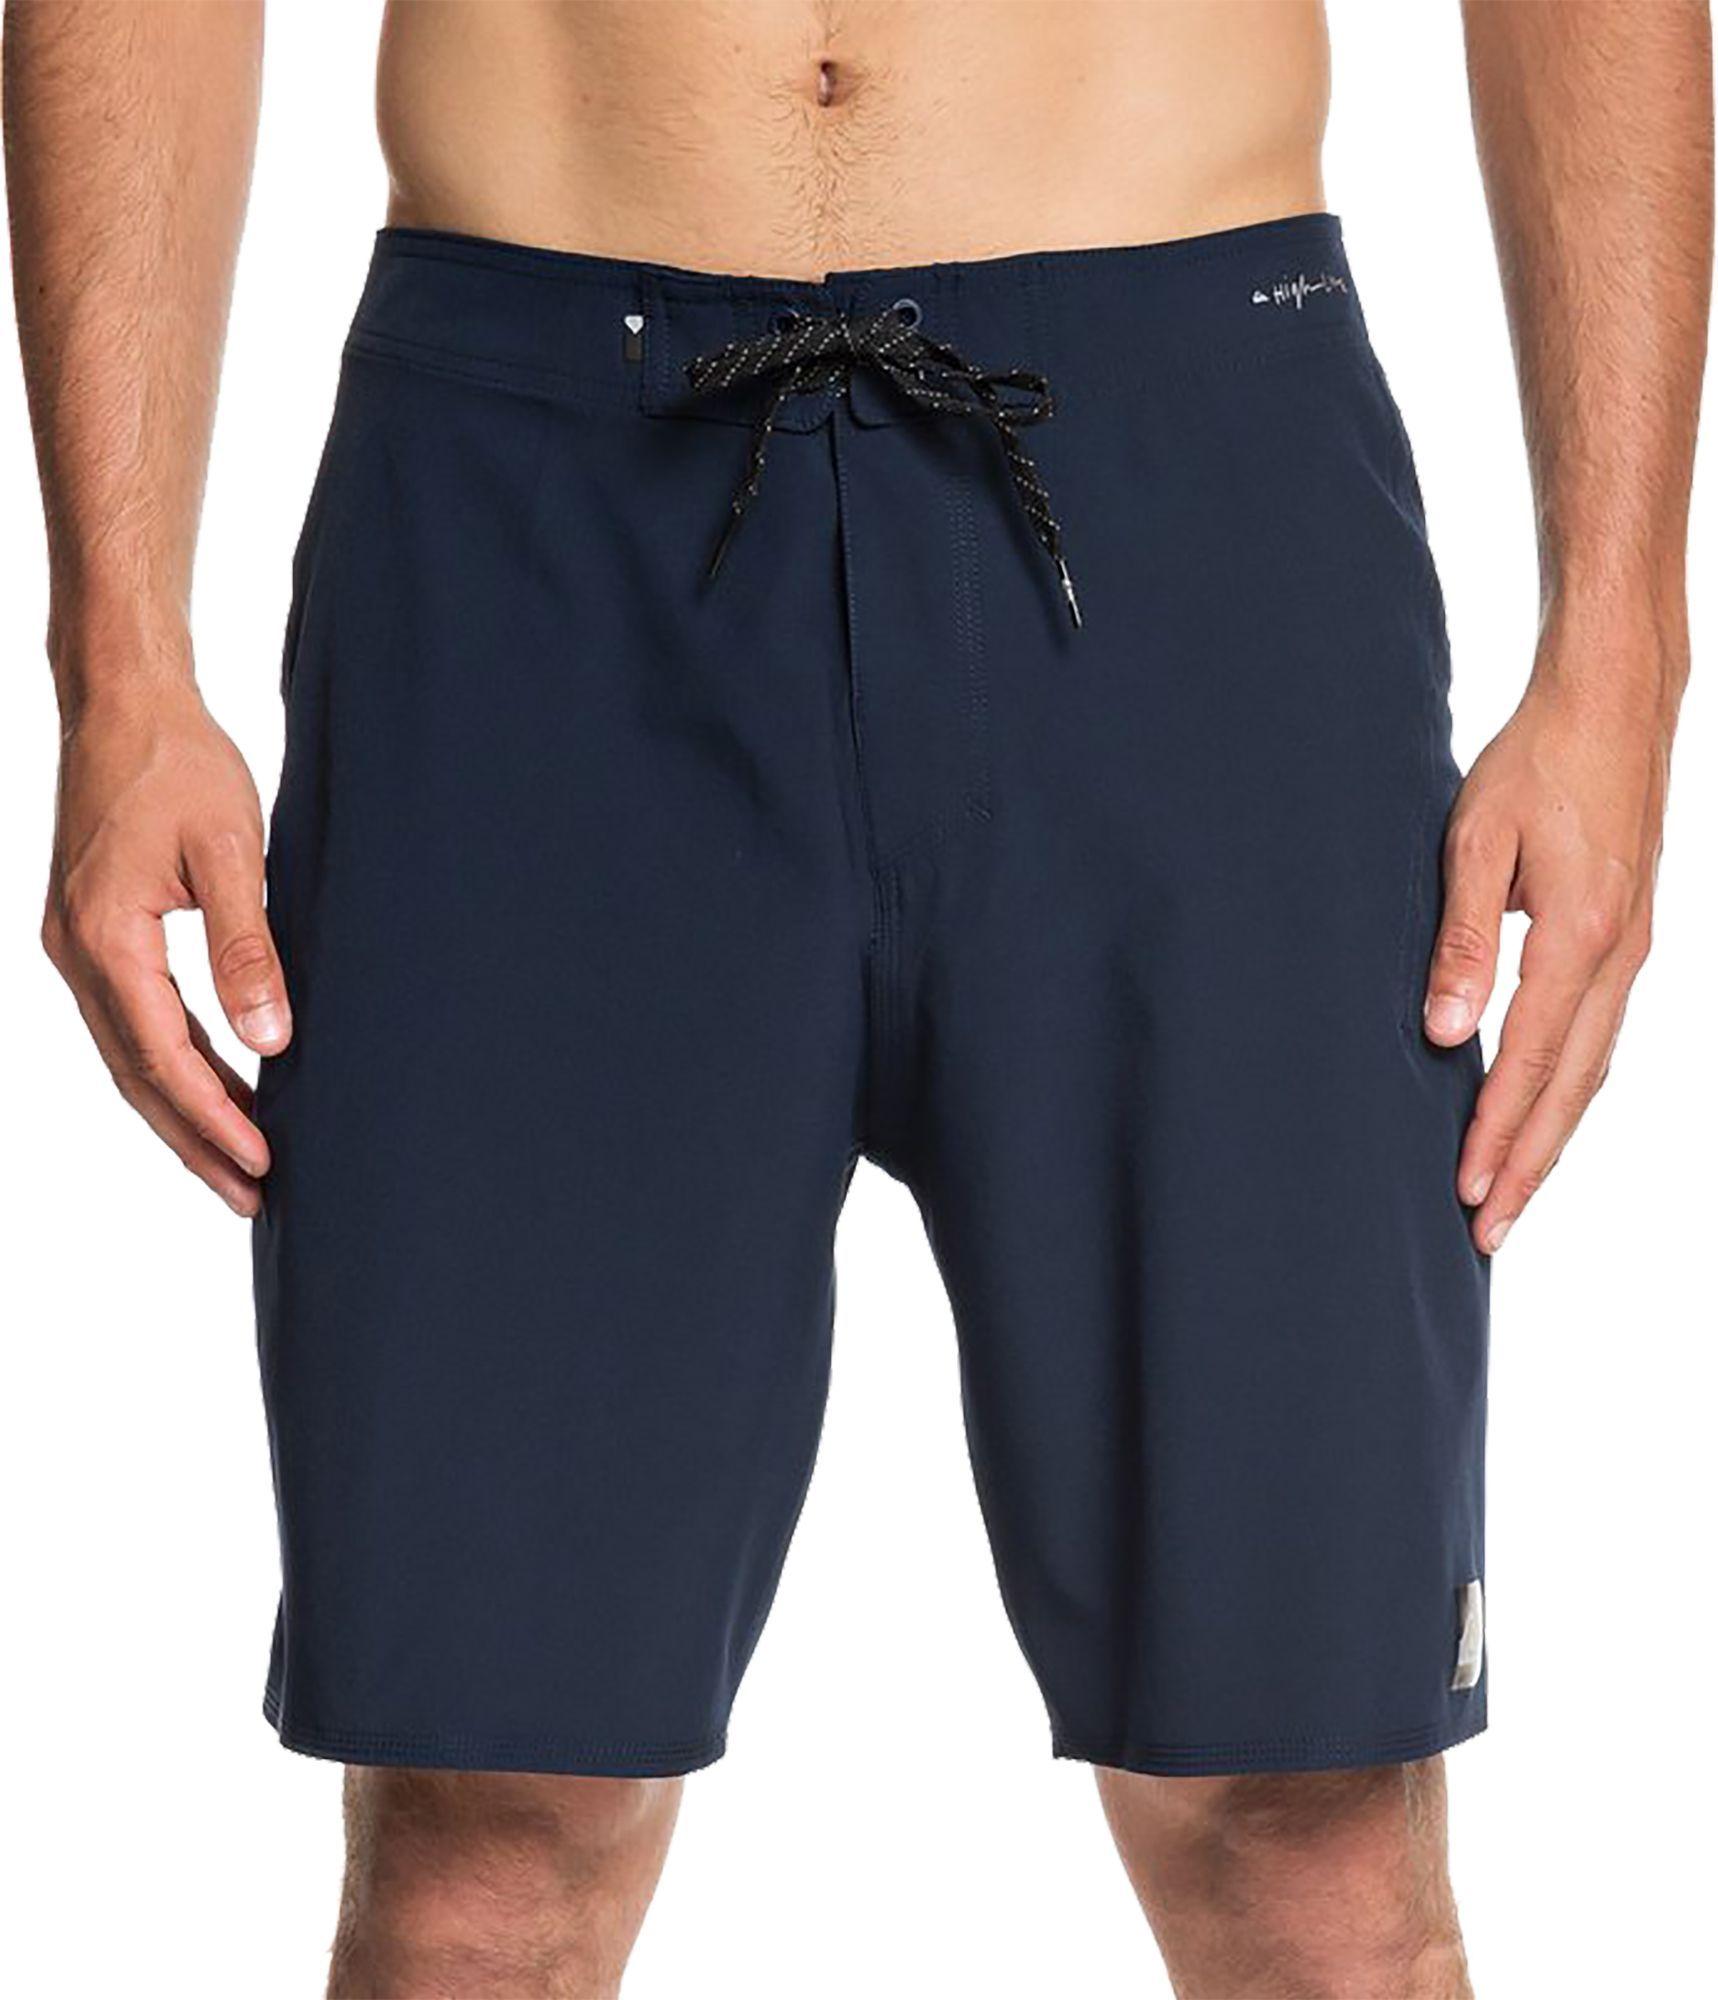 0c8a890f08 Quiksilver Men's Highline Kaimana 20†Board Shorts, Size: 40, Blue